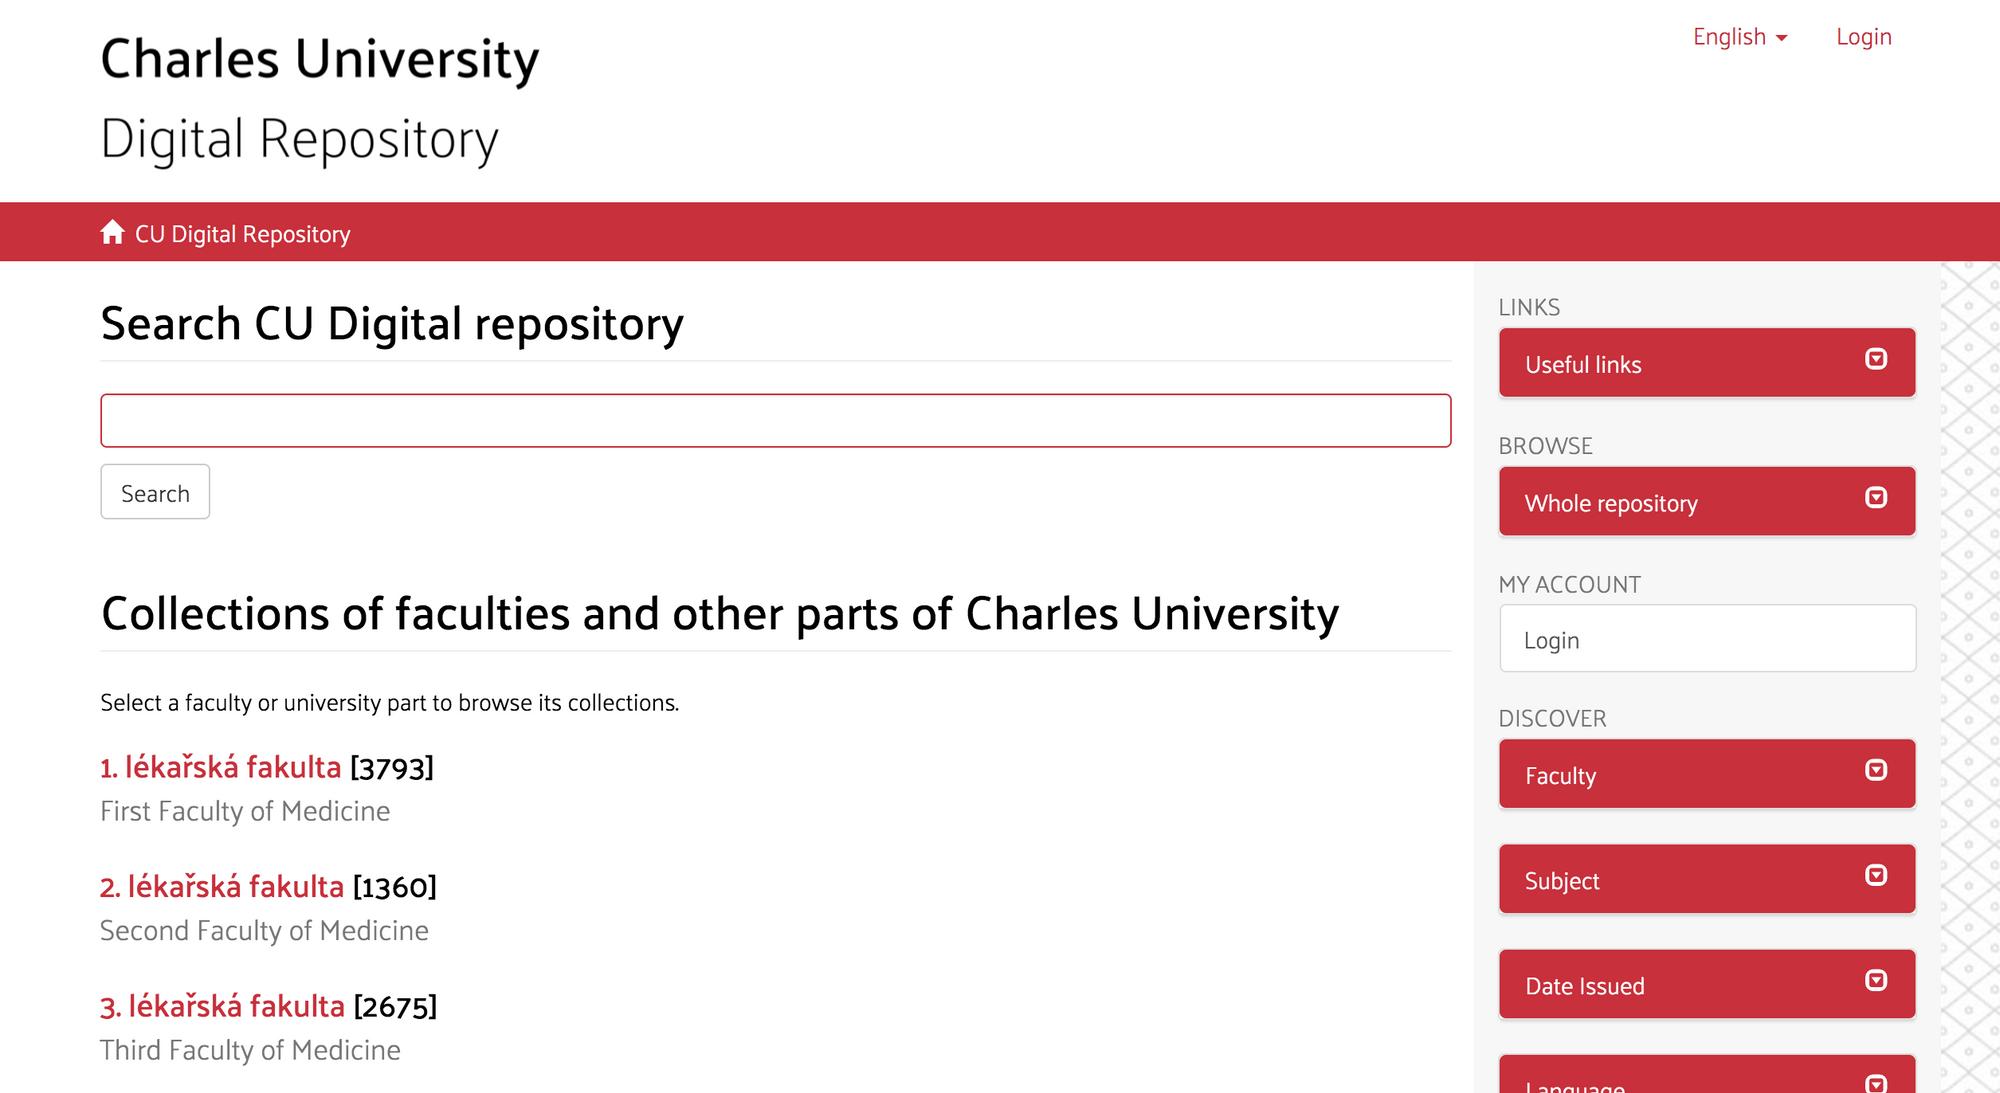 Charles University Digital Repository